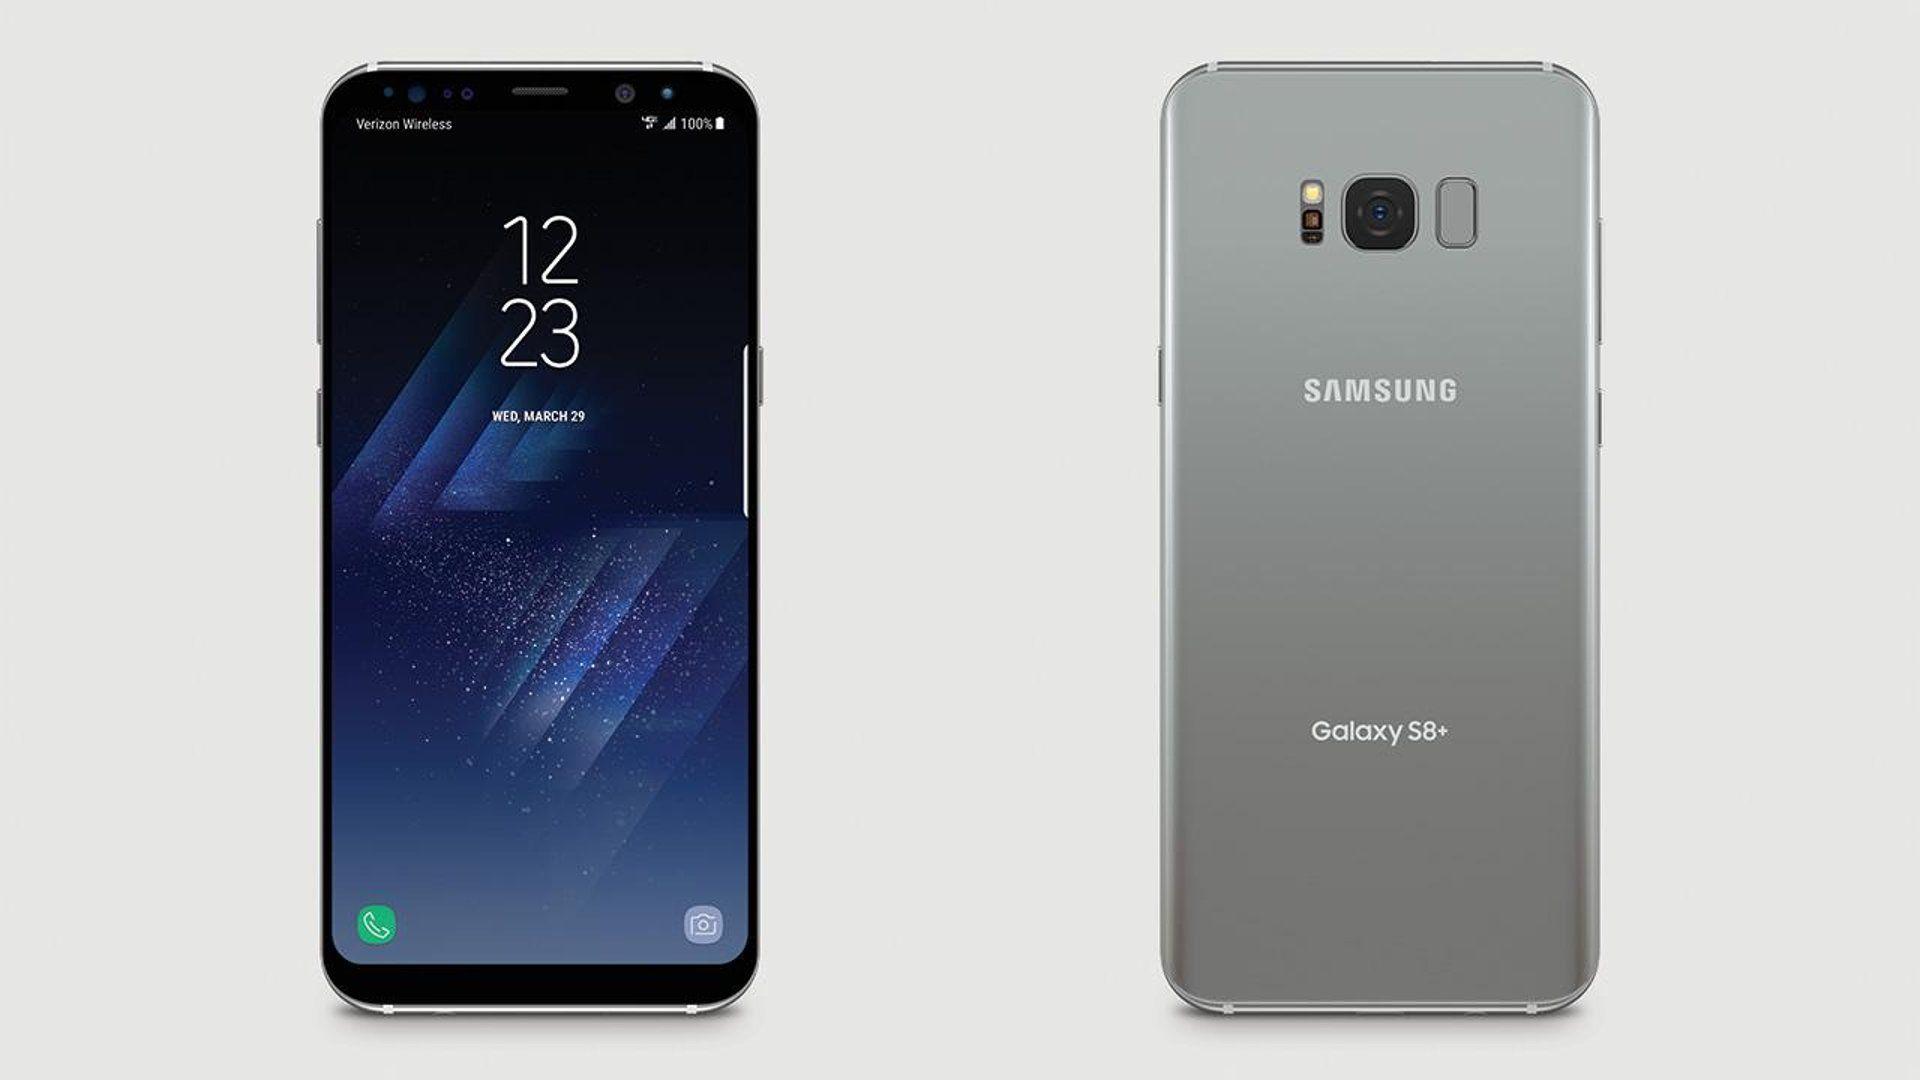 Samsung Galaxy S8+ In Verizon Wireless